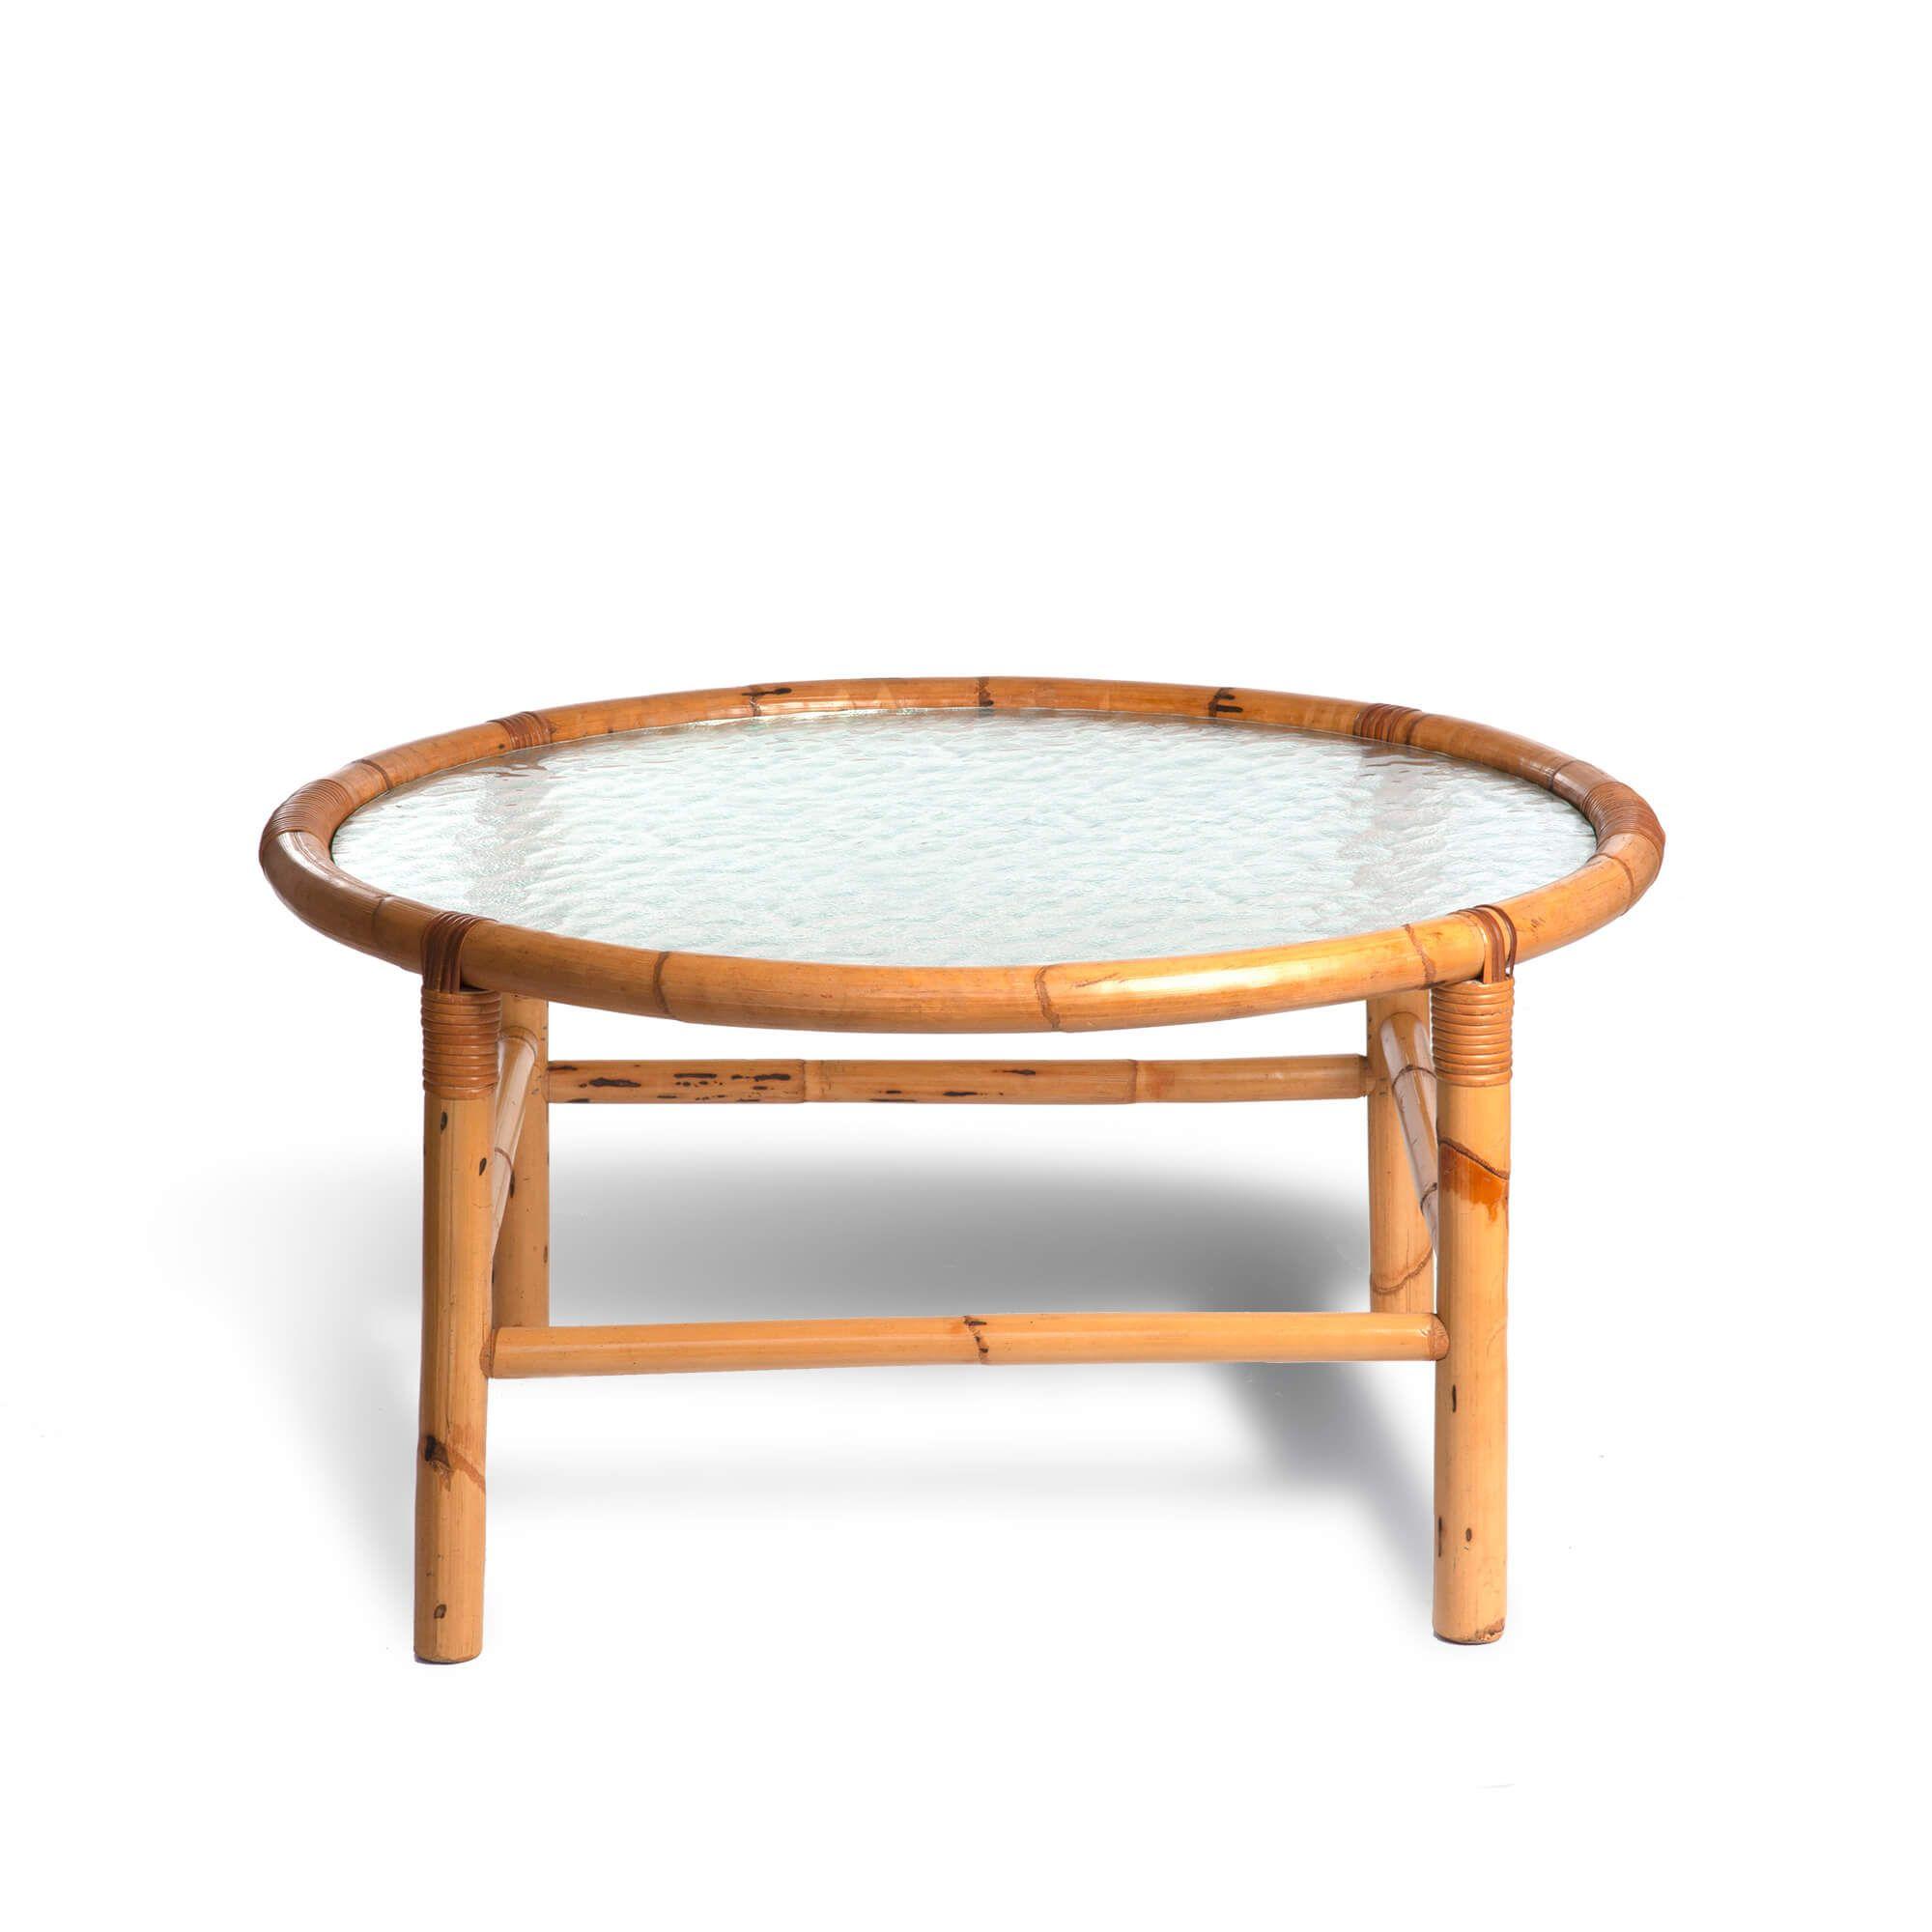 Soho Home Vintage Bamboo Coffee Table Bamboo Coffee Table Coffee Table Bamboo Table [ 2000 x 2000 Pixel ]